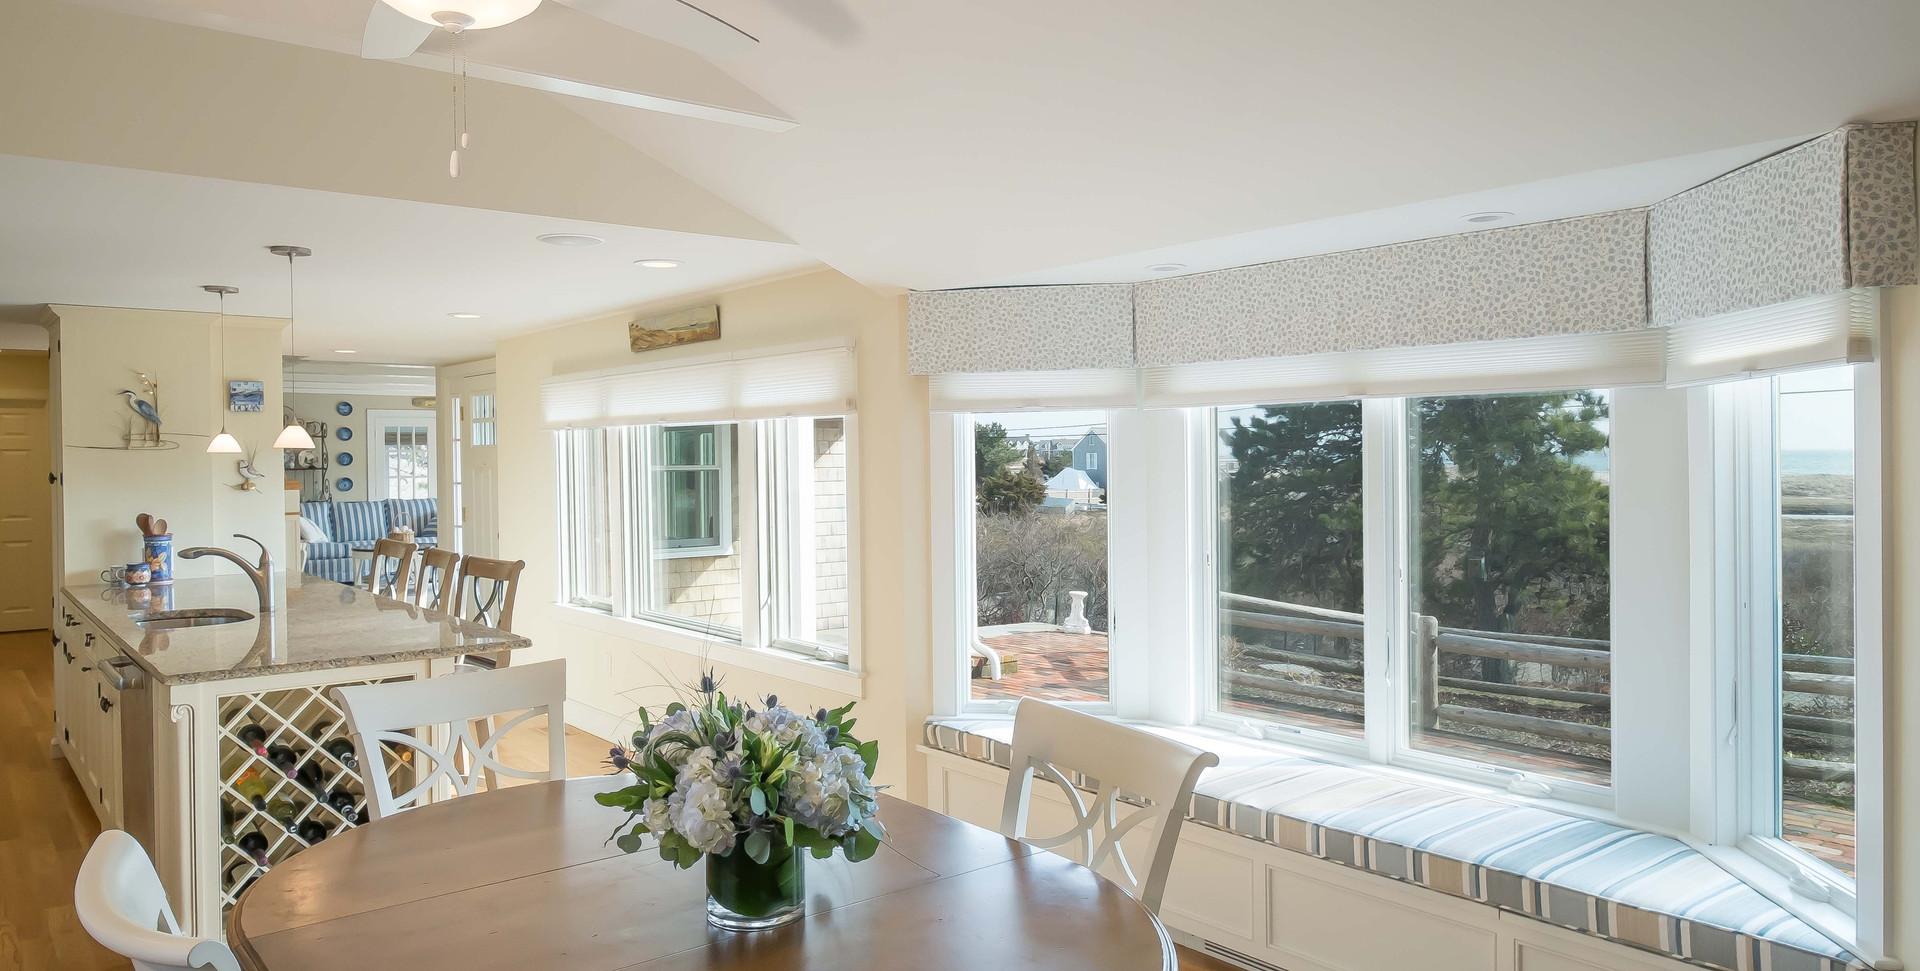 Ridgevale Beach, West Chatham, MA, Home Remodel, Cape Cod Kitchen